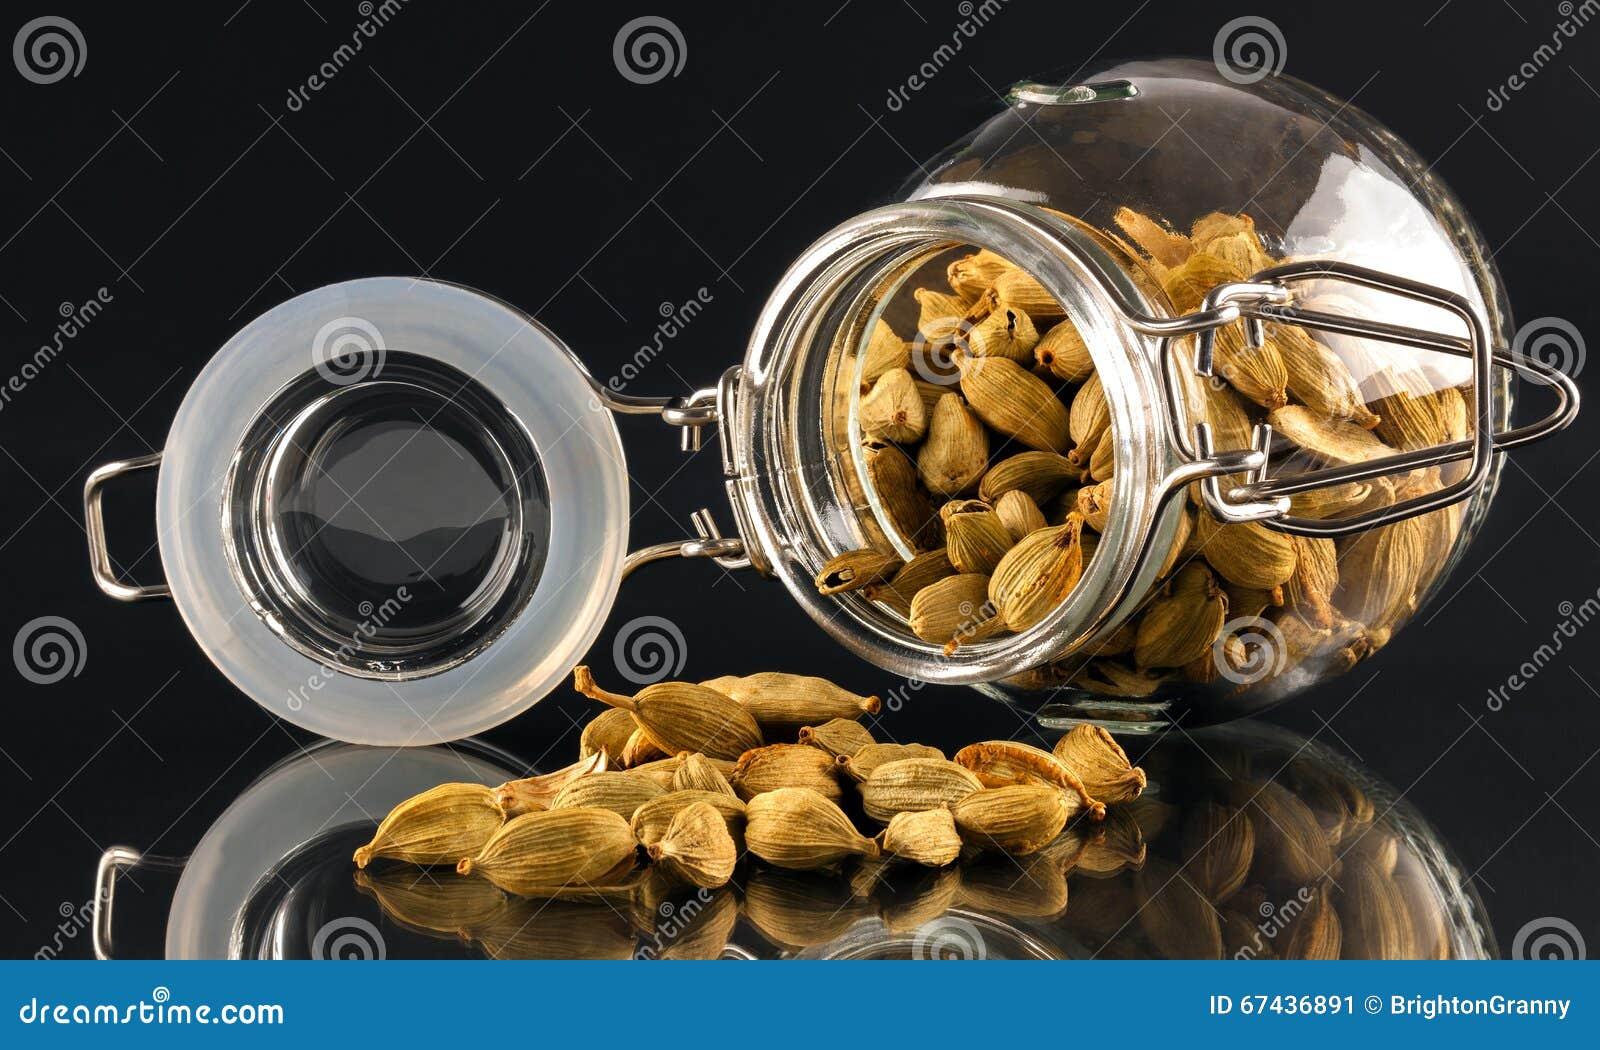 Jar of cardamom pods